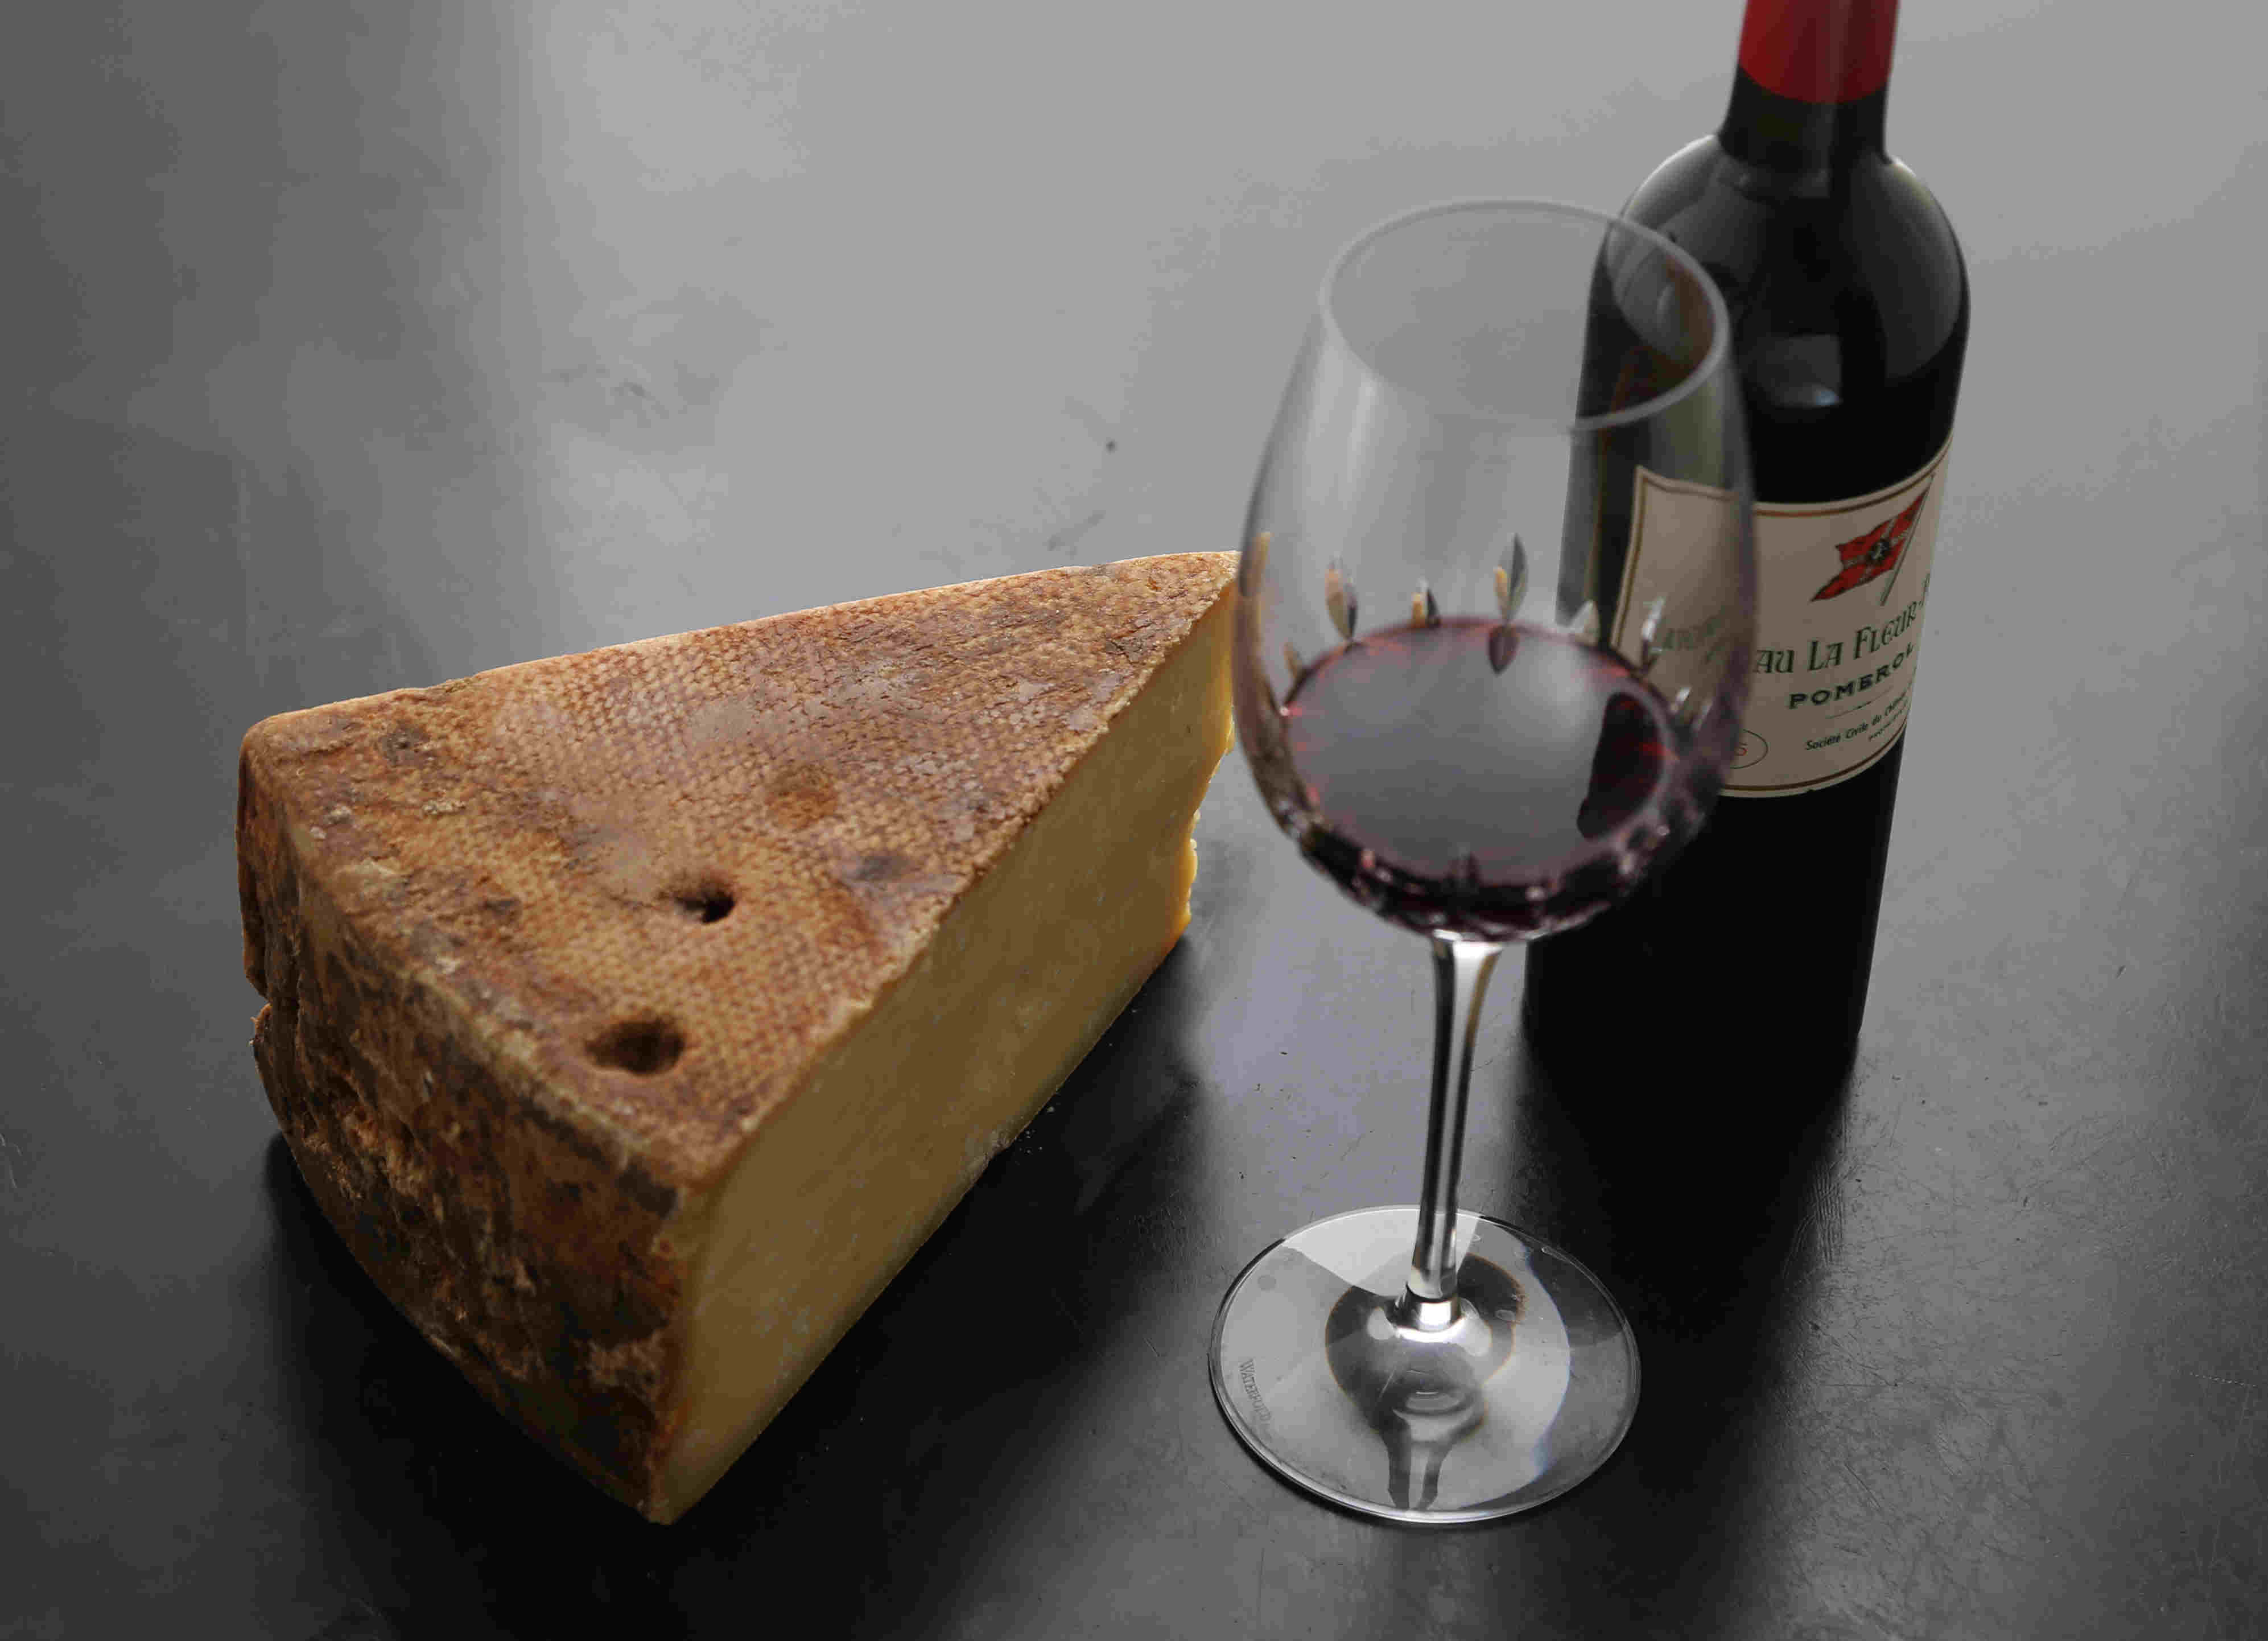 Alpages - Fine Swiss Alpine Cheeses